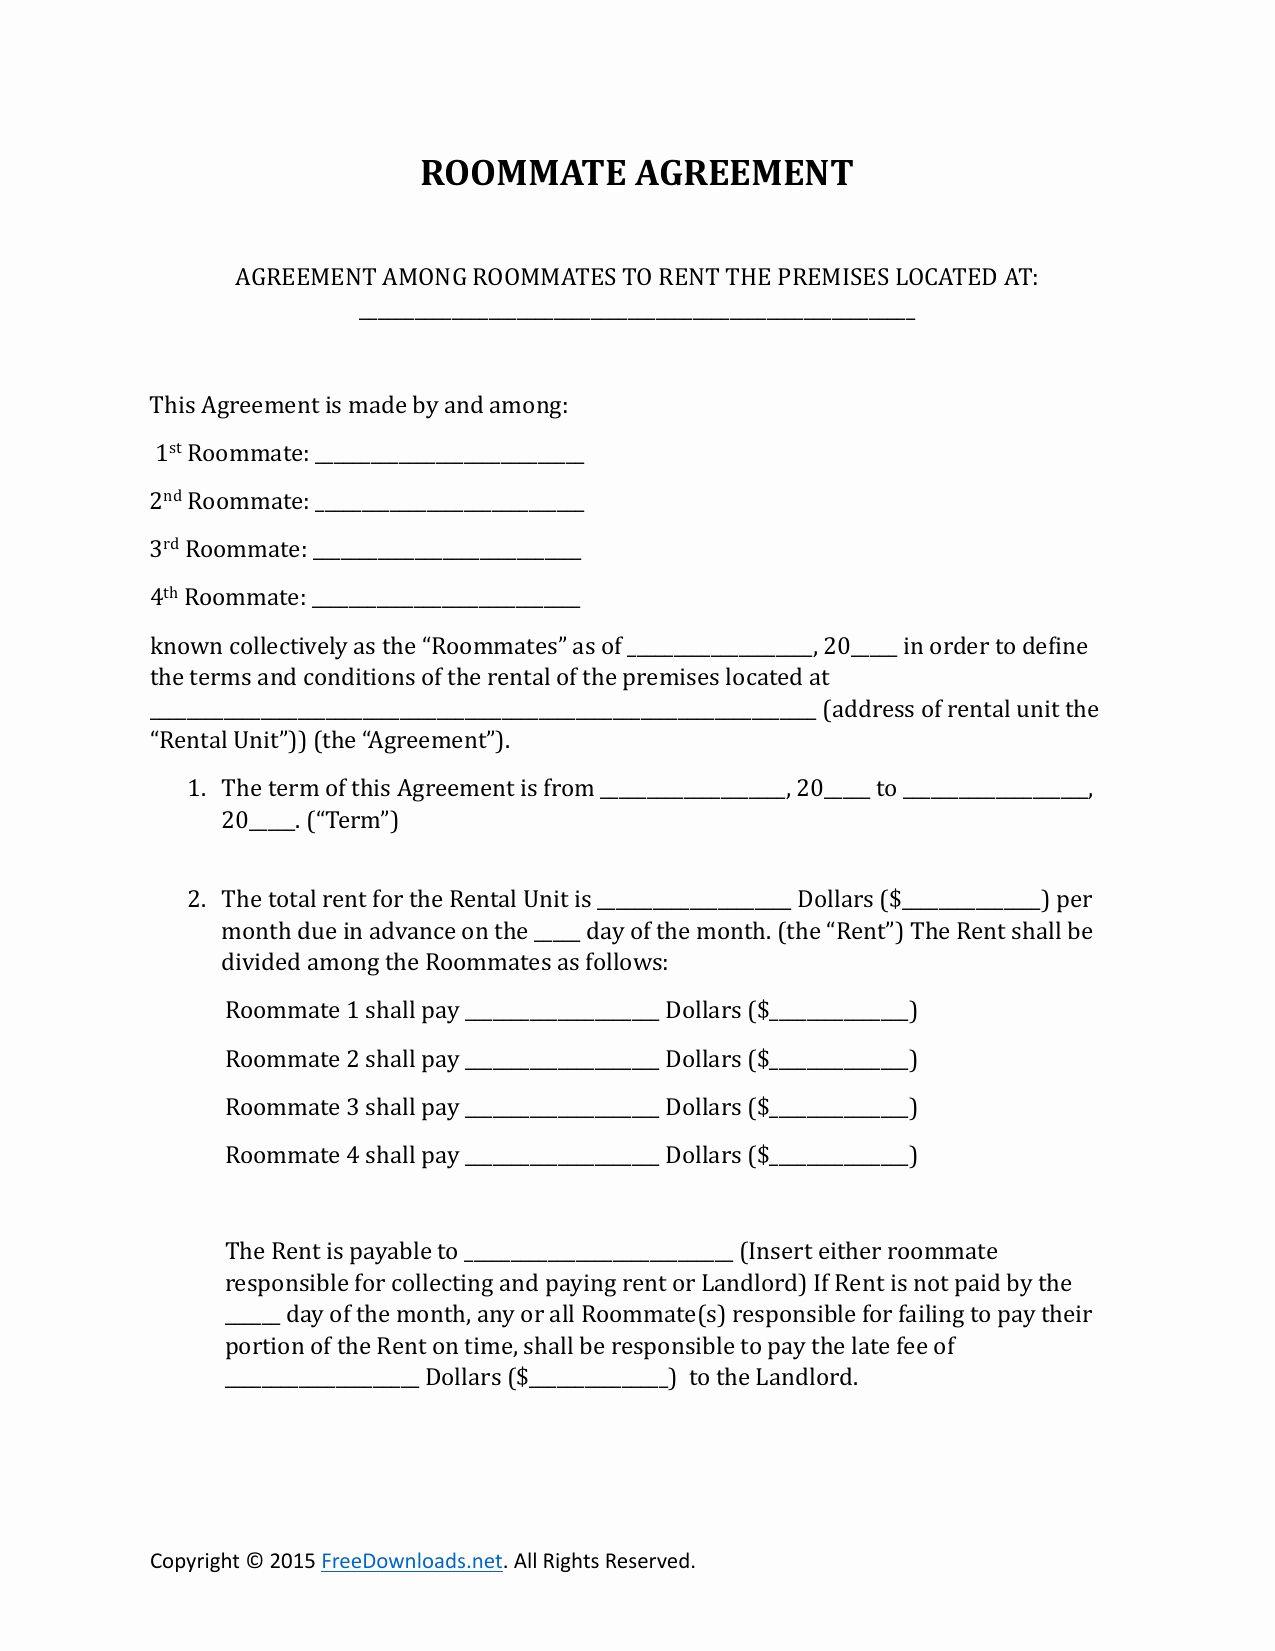 Roommate Rental Agreement Template Elegant Download